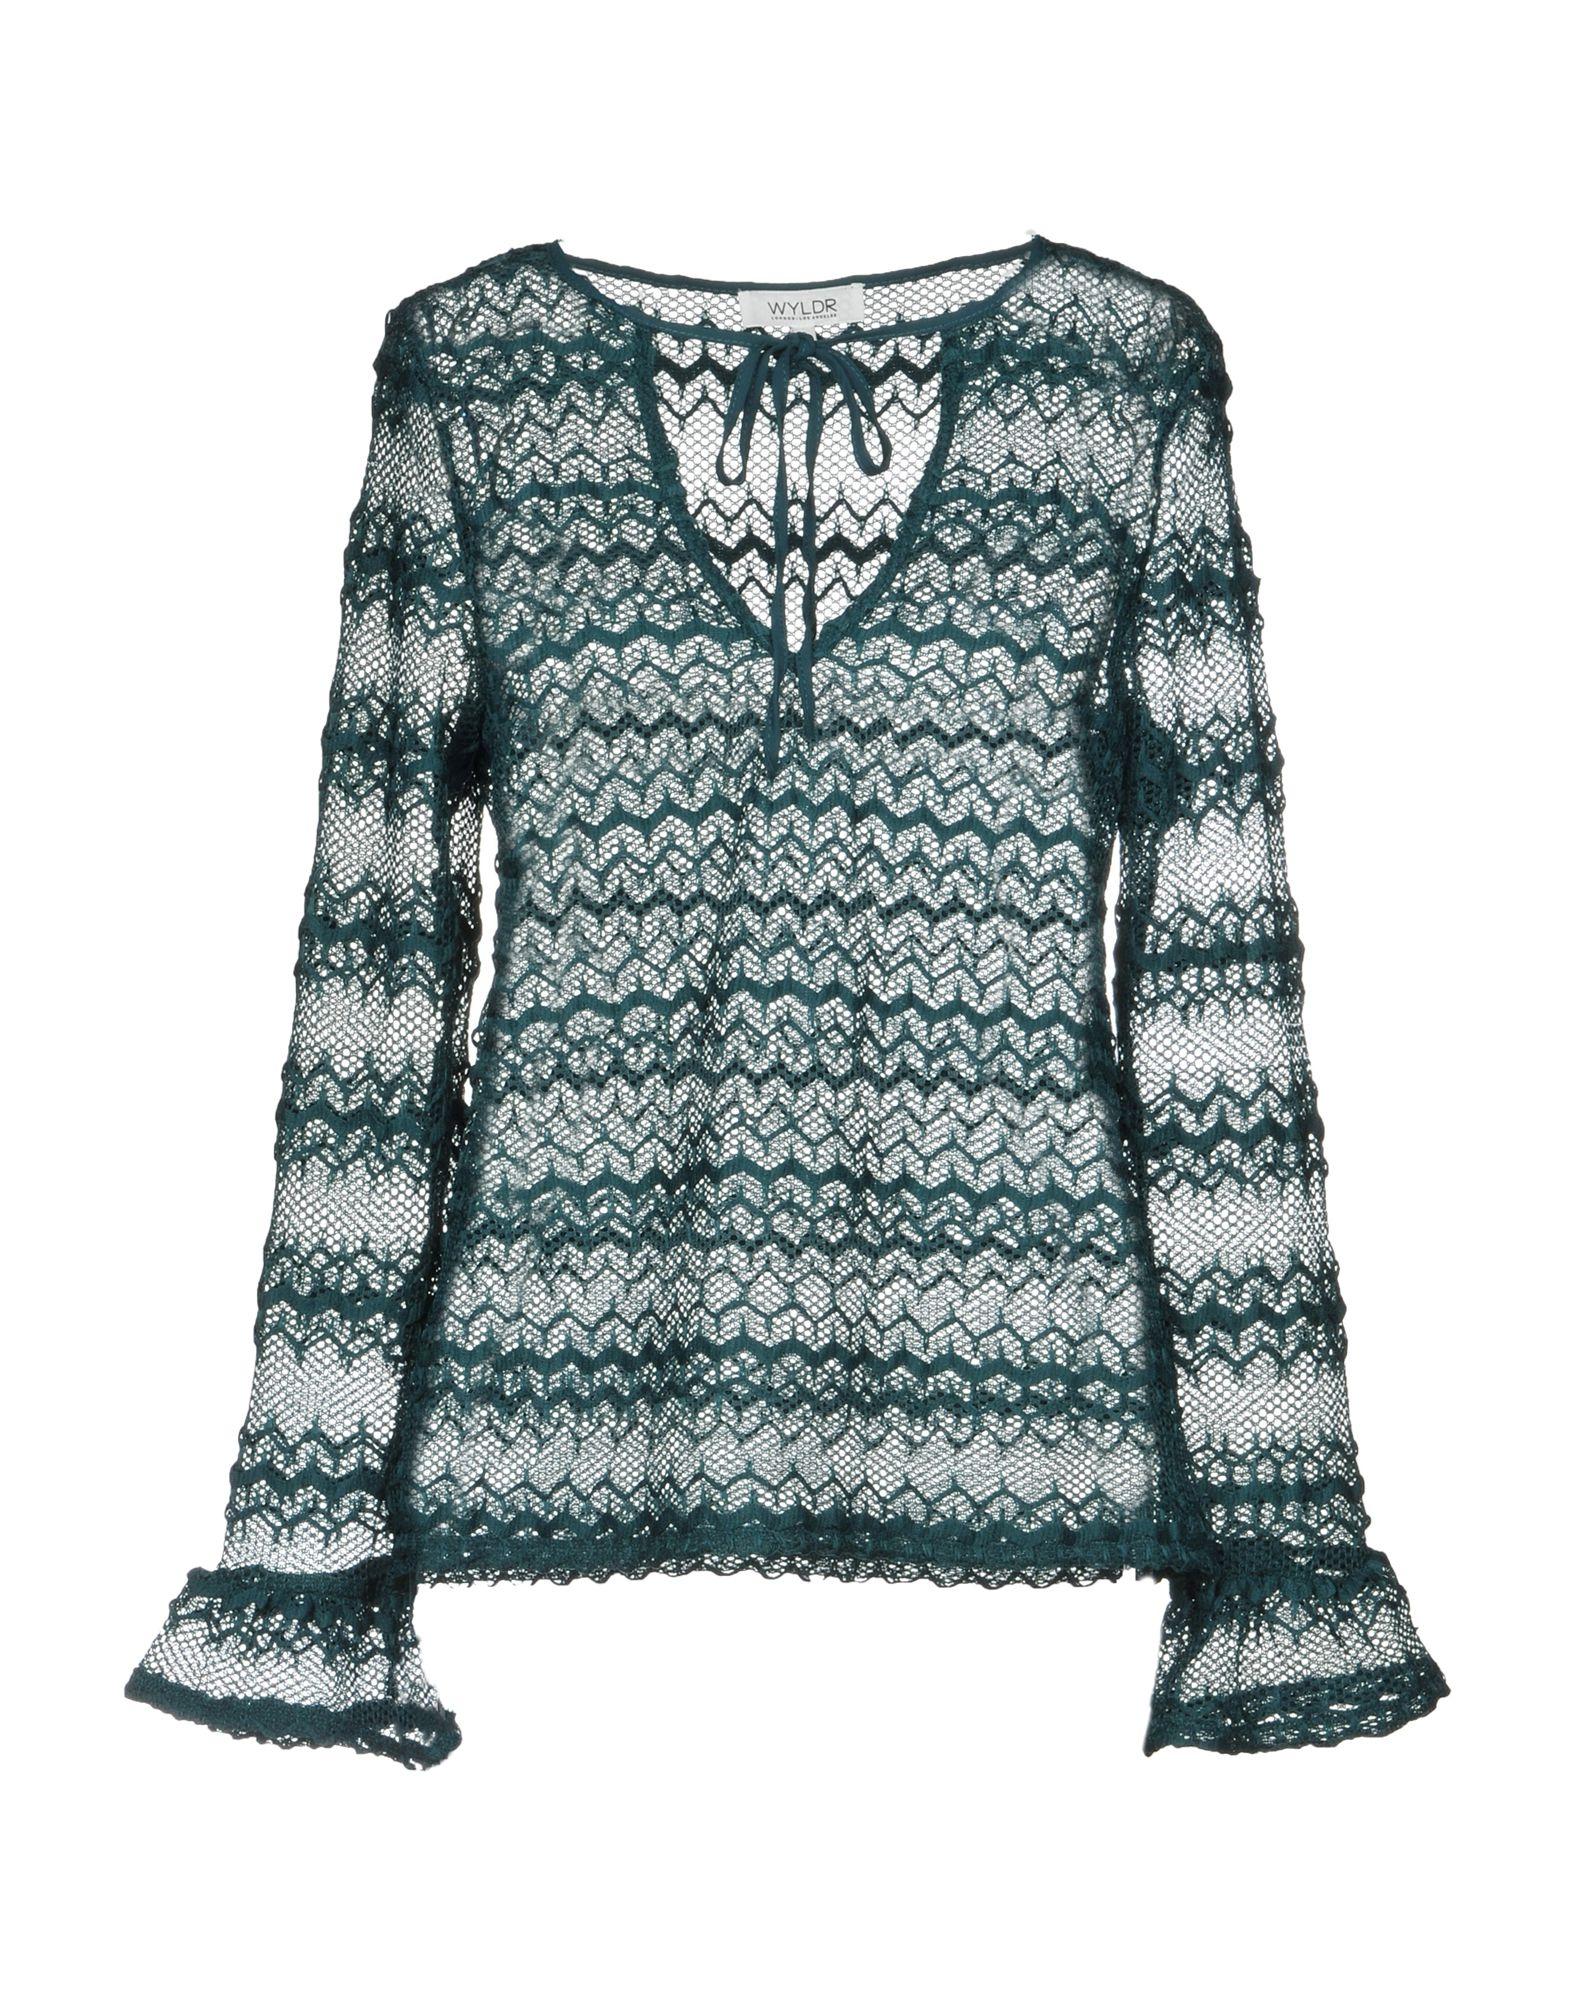 WYLDR Sweater in Emerald Green